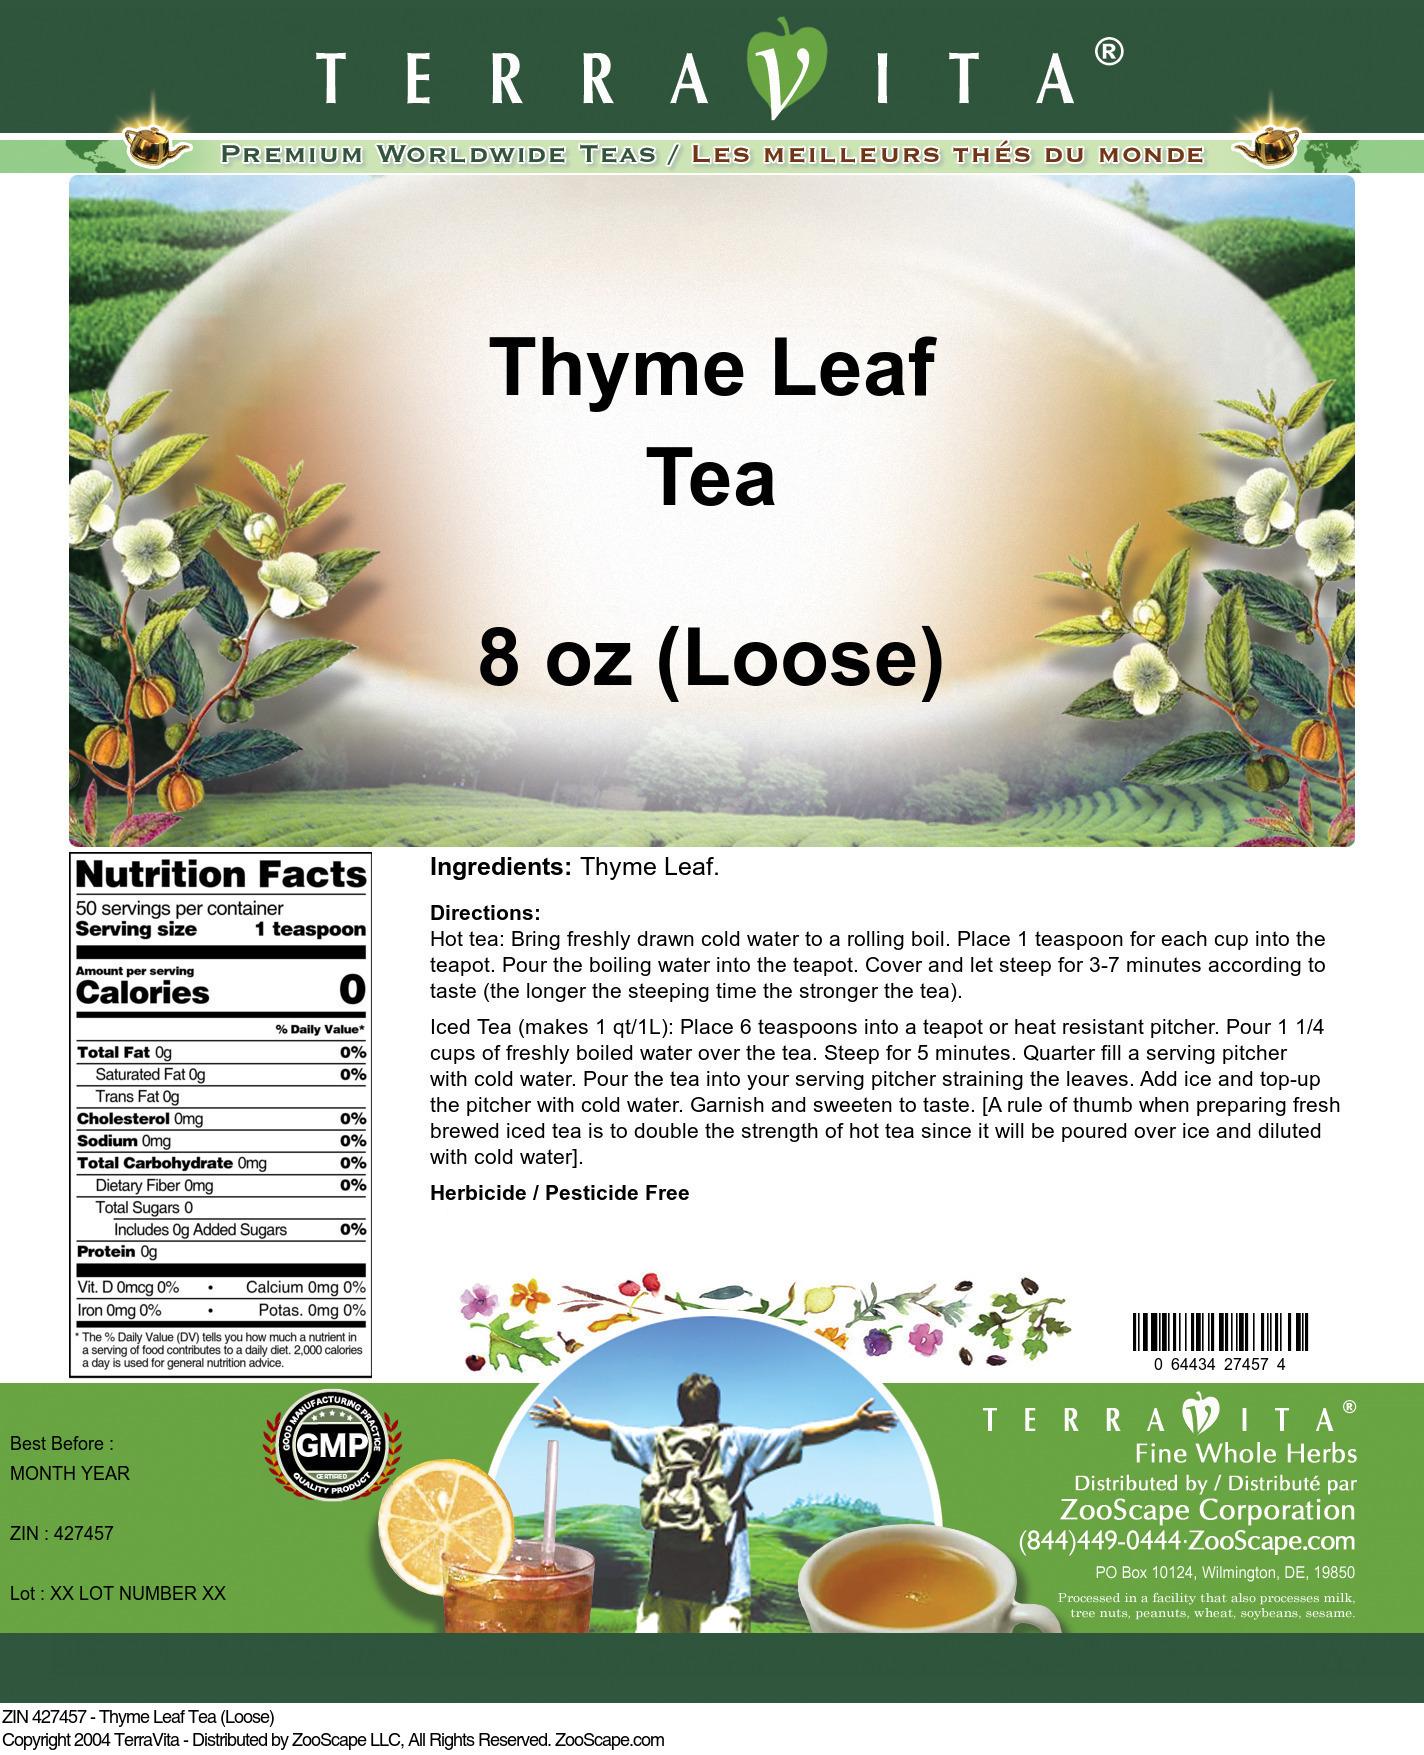 Thyme Leaf Tea (Loose) - Label